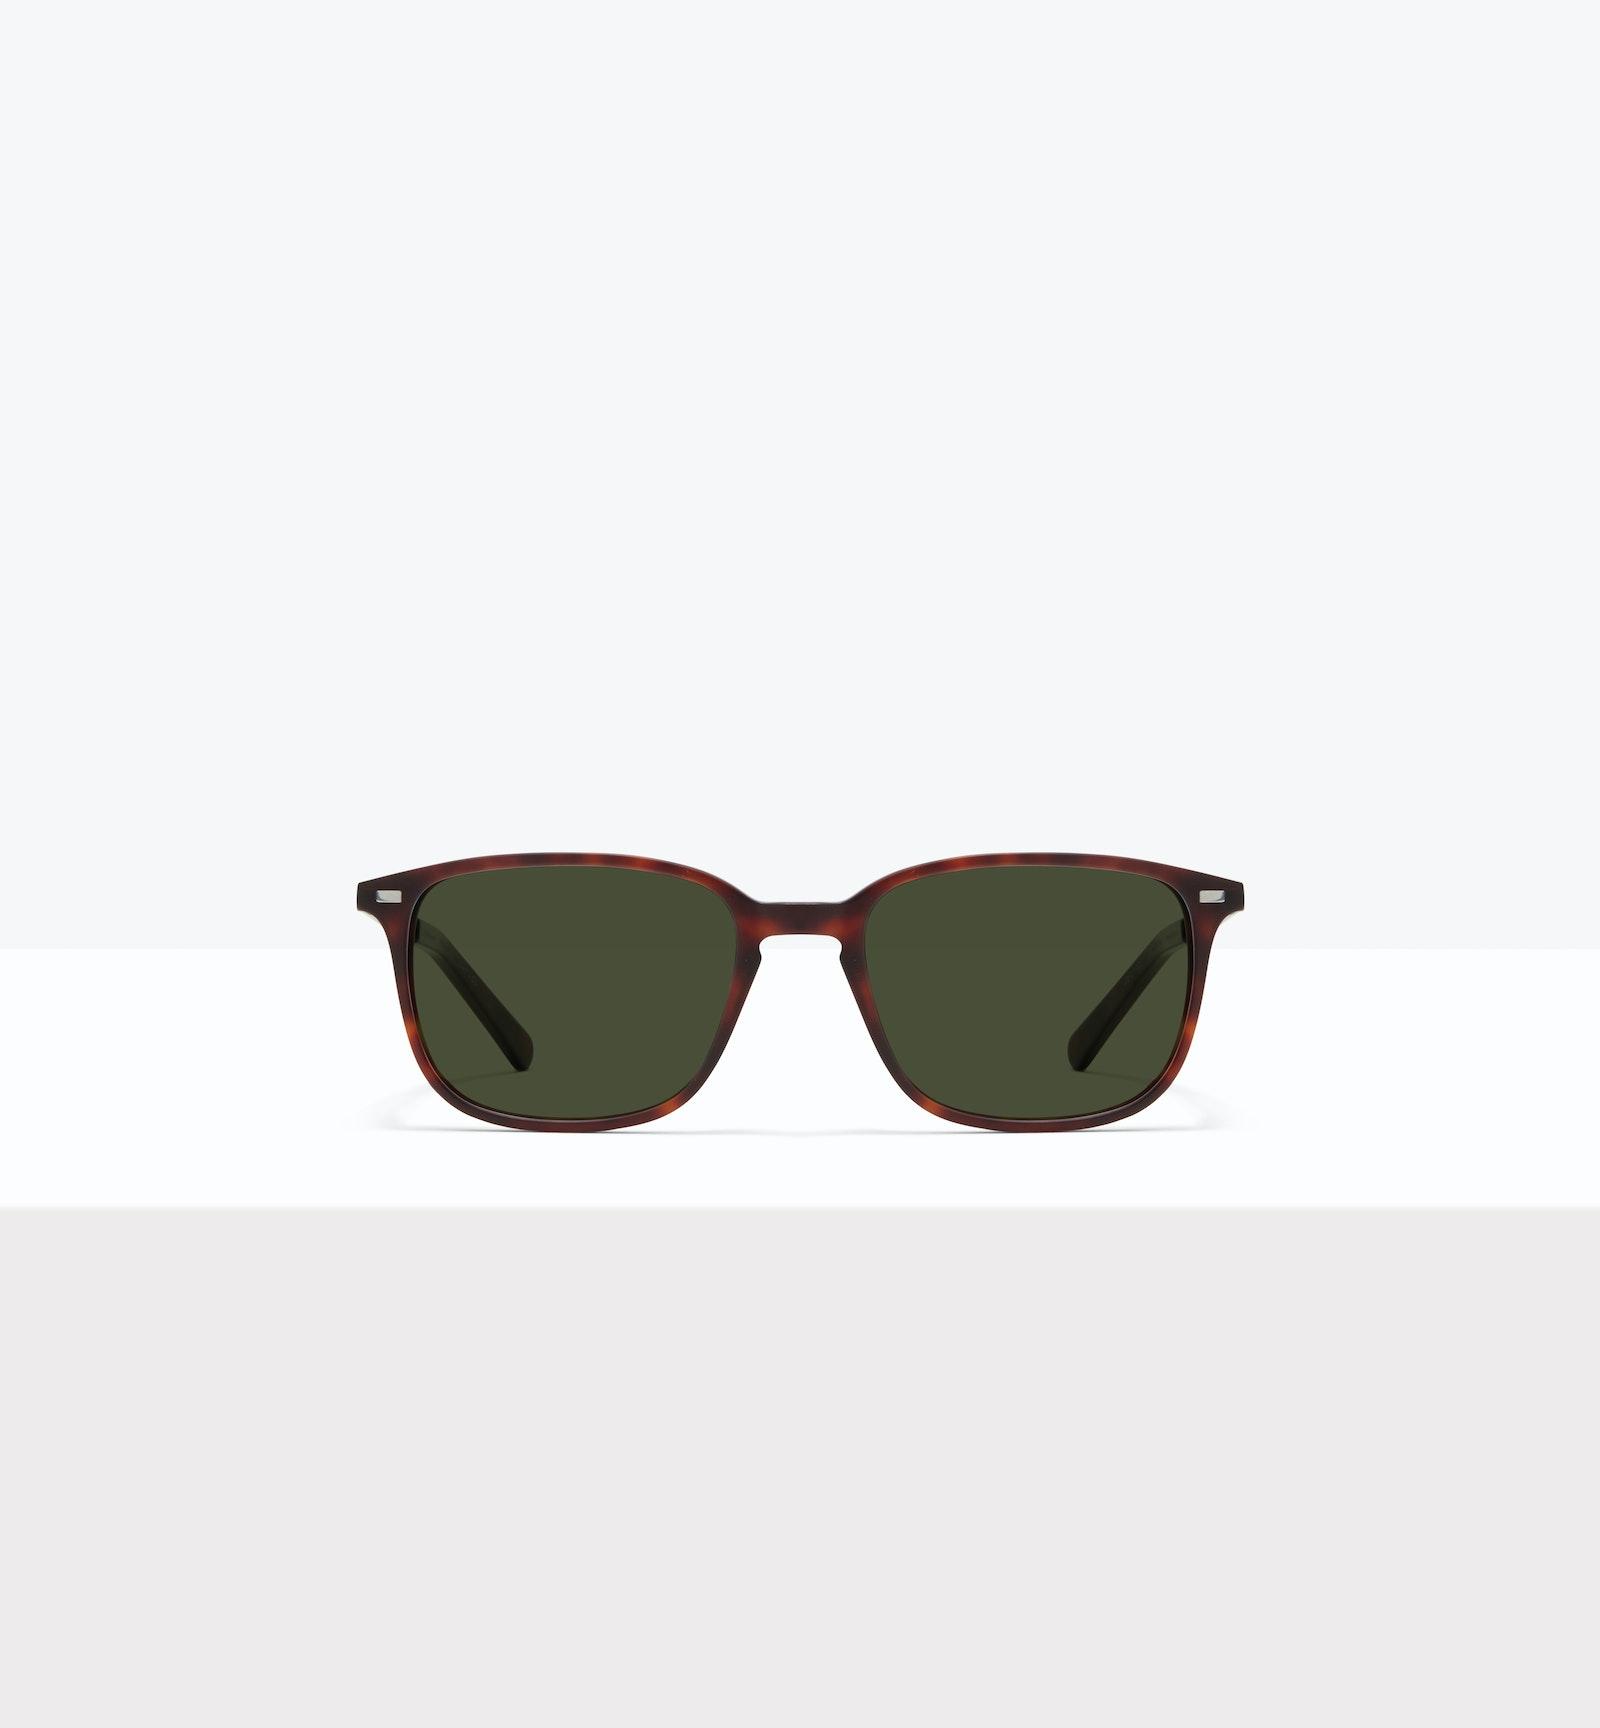 Affordable Fashion Glasses Rectangle Sunglasses Men Sharp S Matte Tort